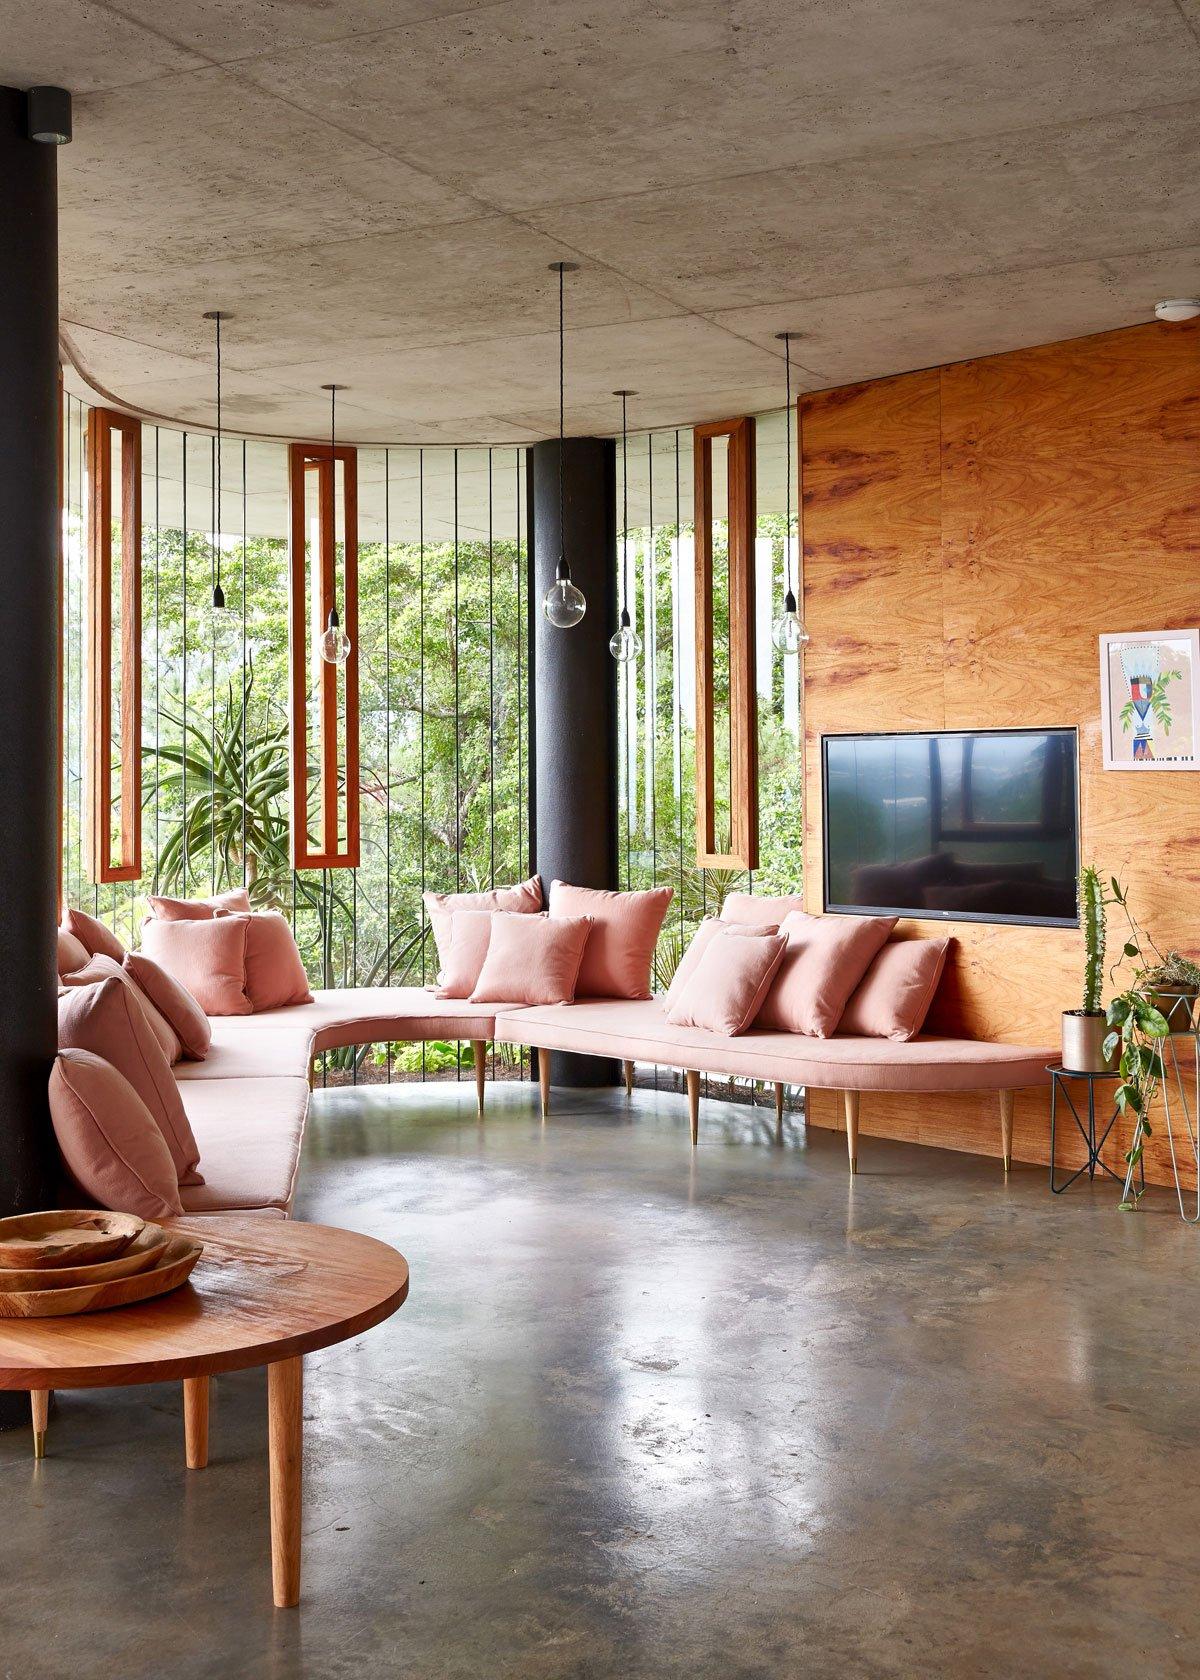 Jesse Bennett Architect, дома в лесу, красивые дома в лесу, самые красивые дома в лесу, Planchonella House, дом с видом на лес, дом с окнами на лес